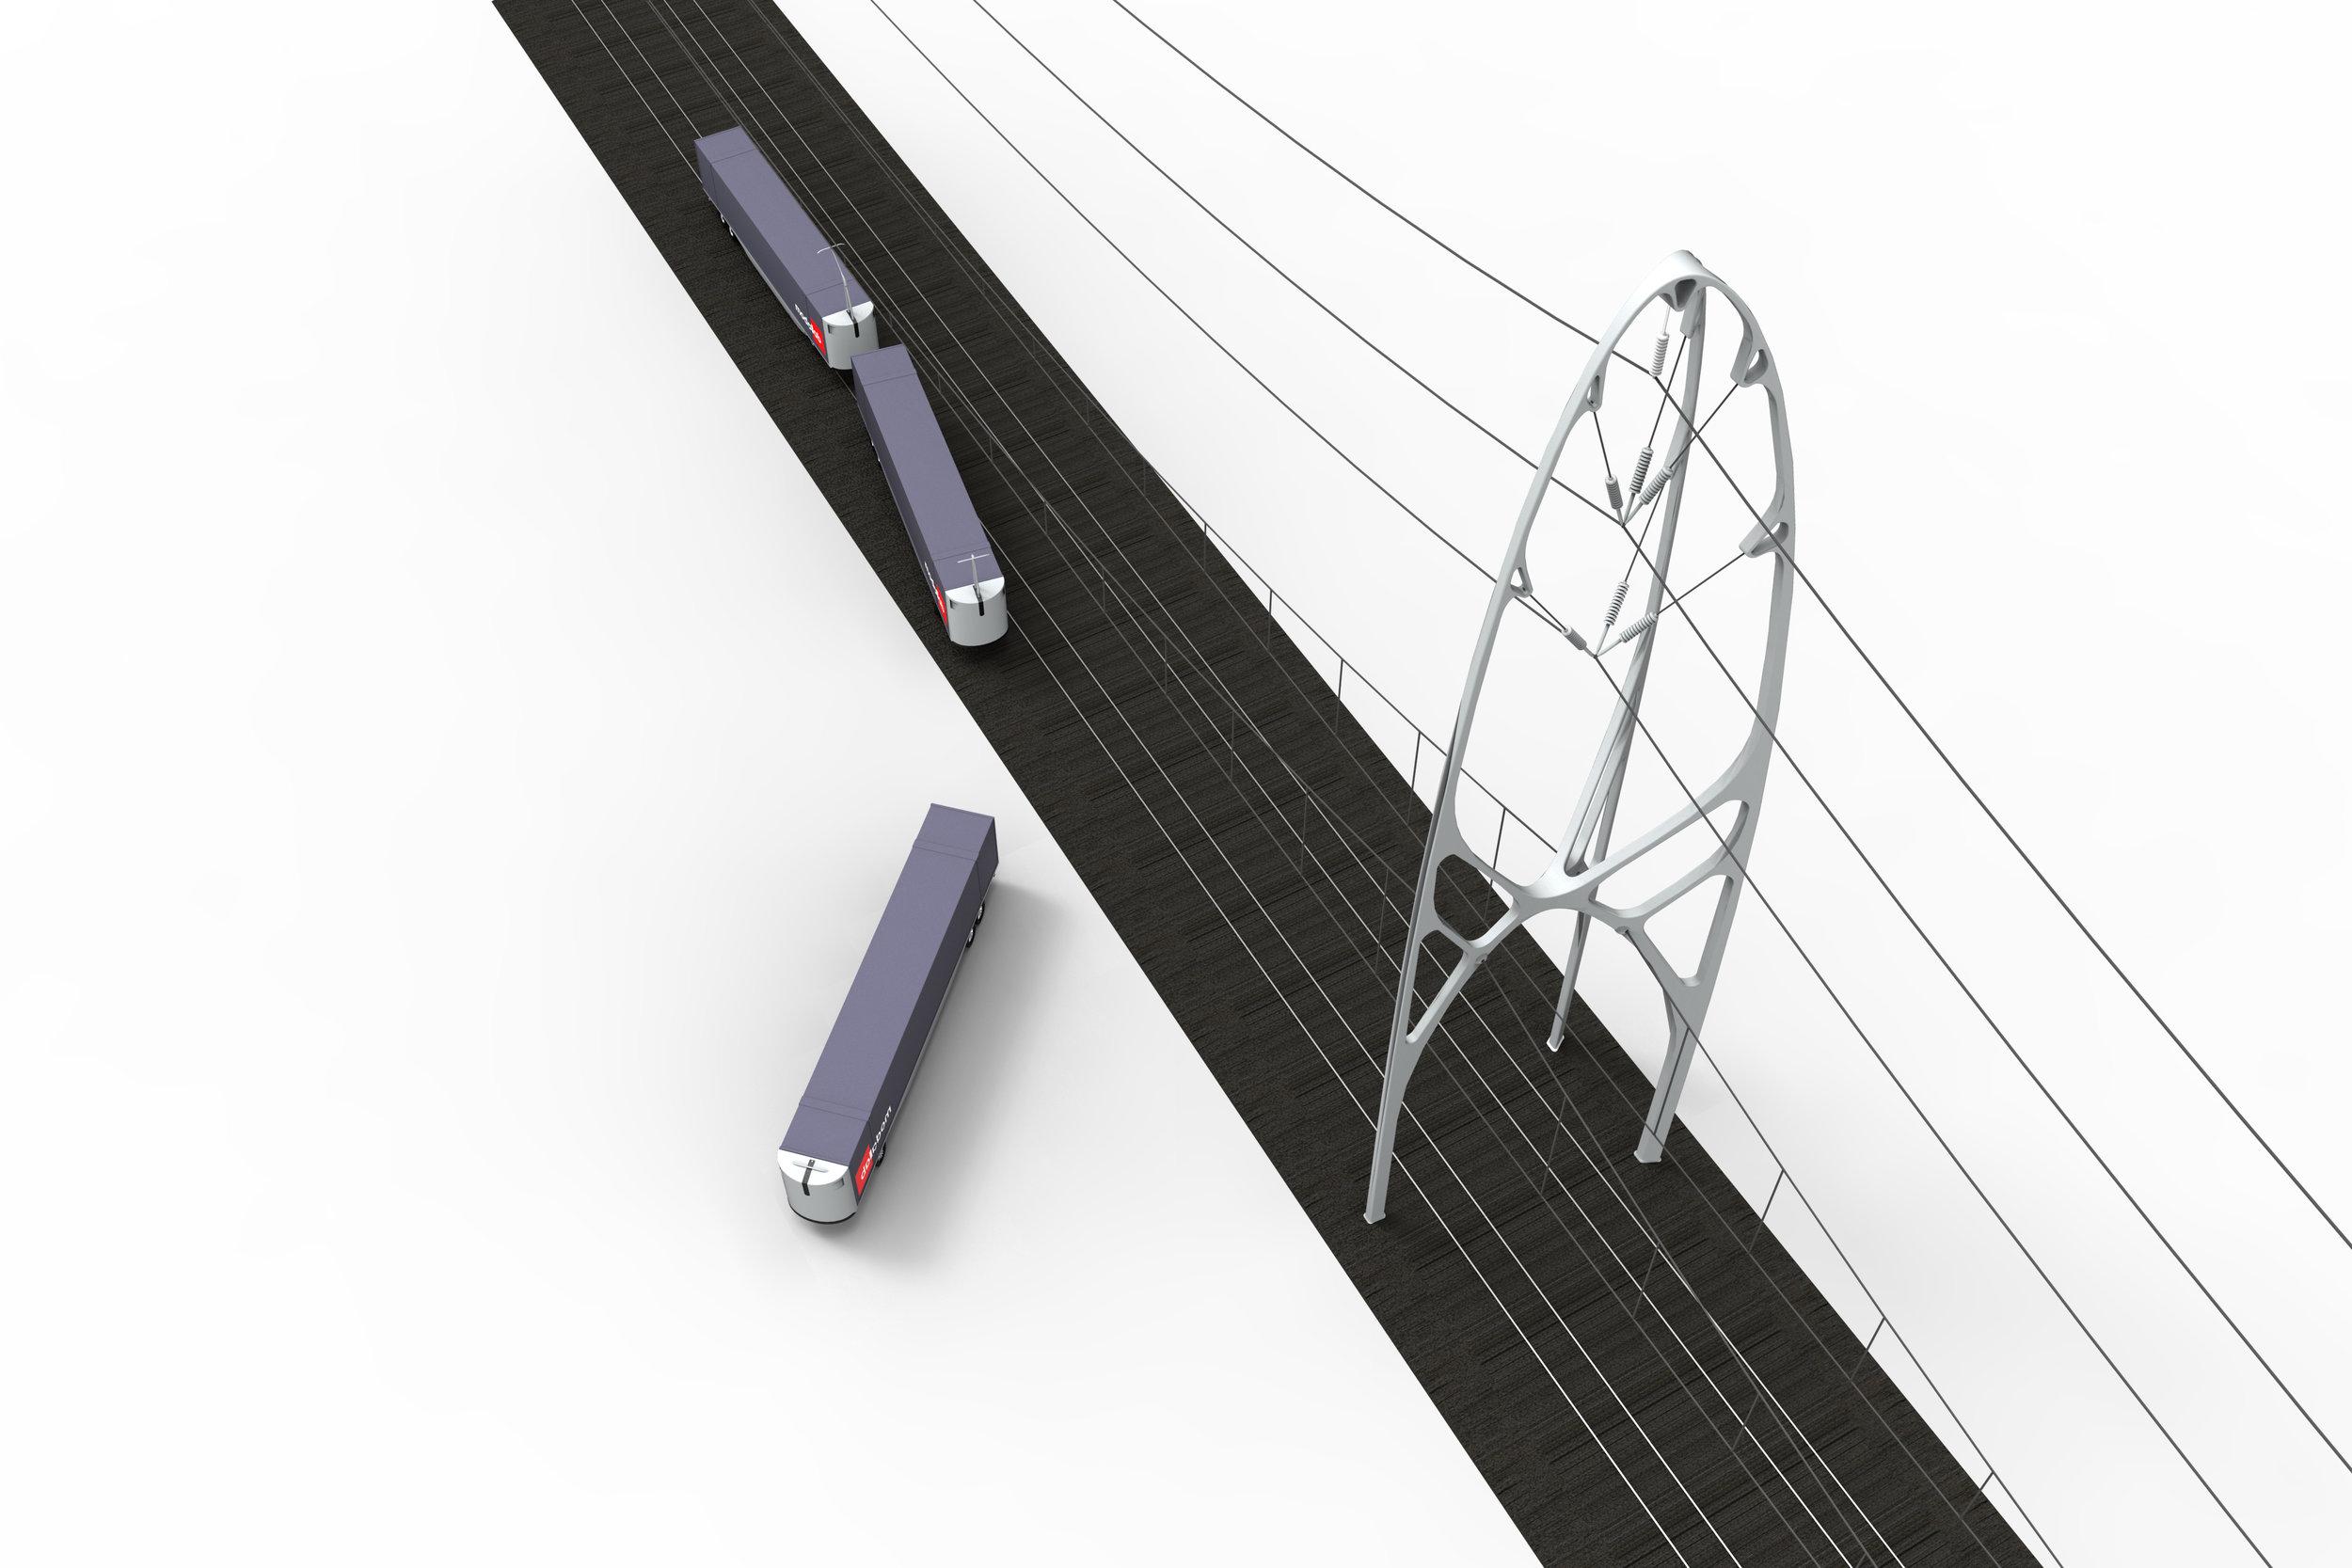 Modallab-leaving-rails-OH.jpg